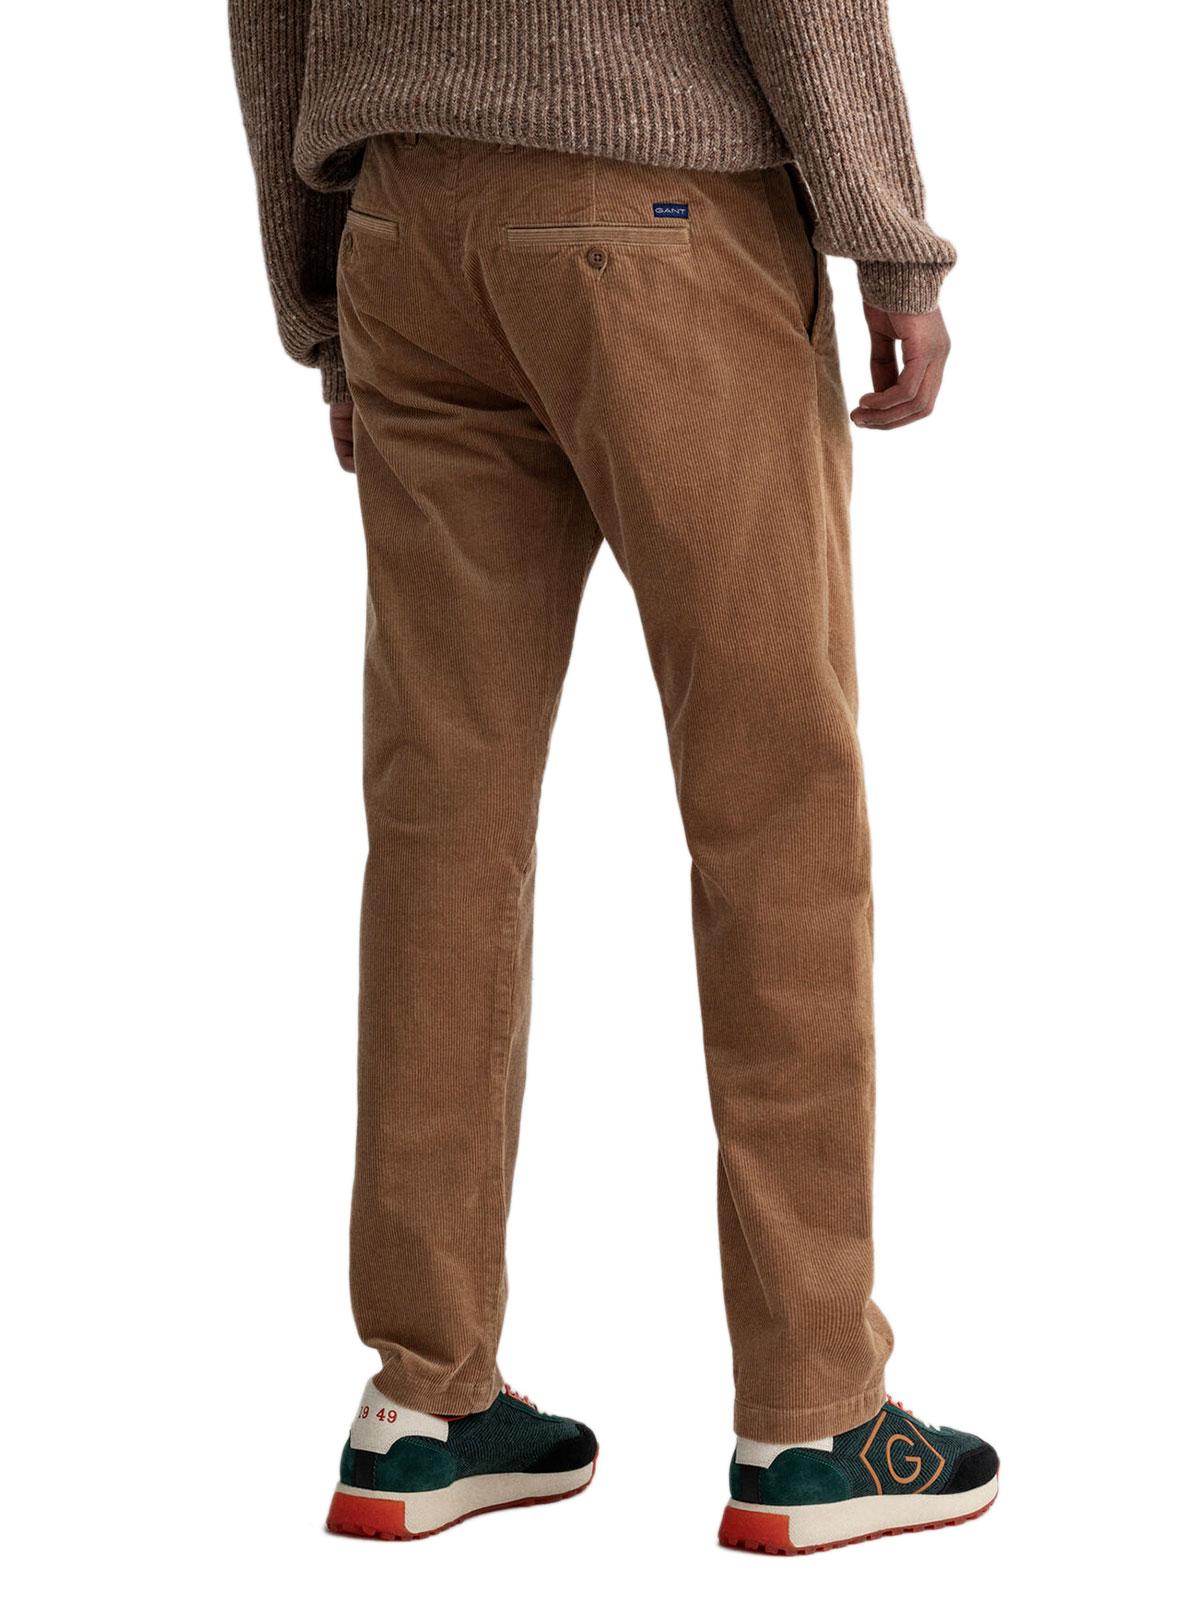 Immagine di Gant | Trousers D1. Allister Cord Chinos